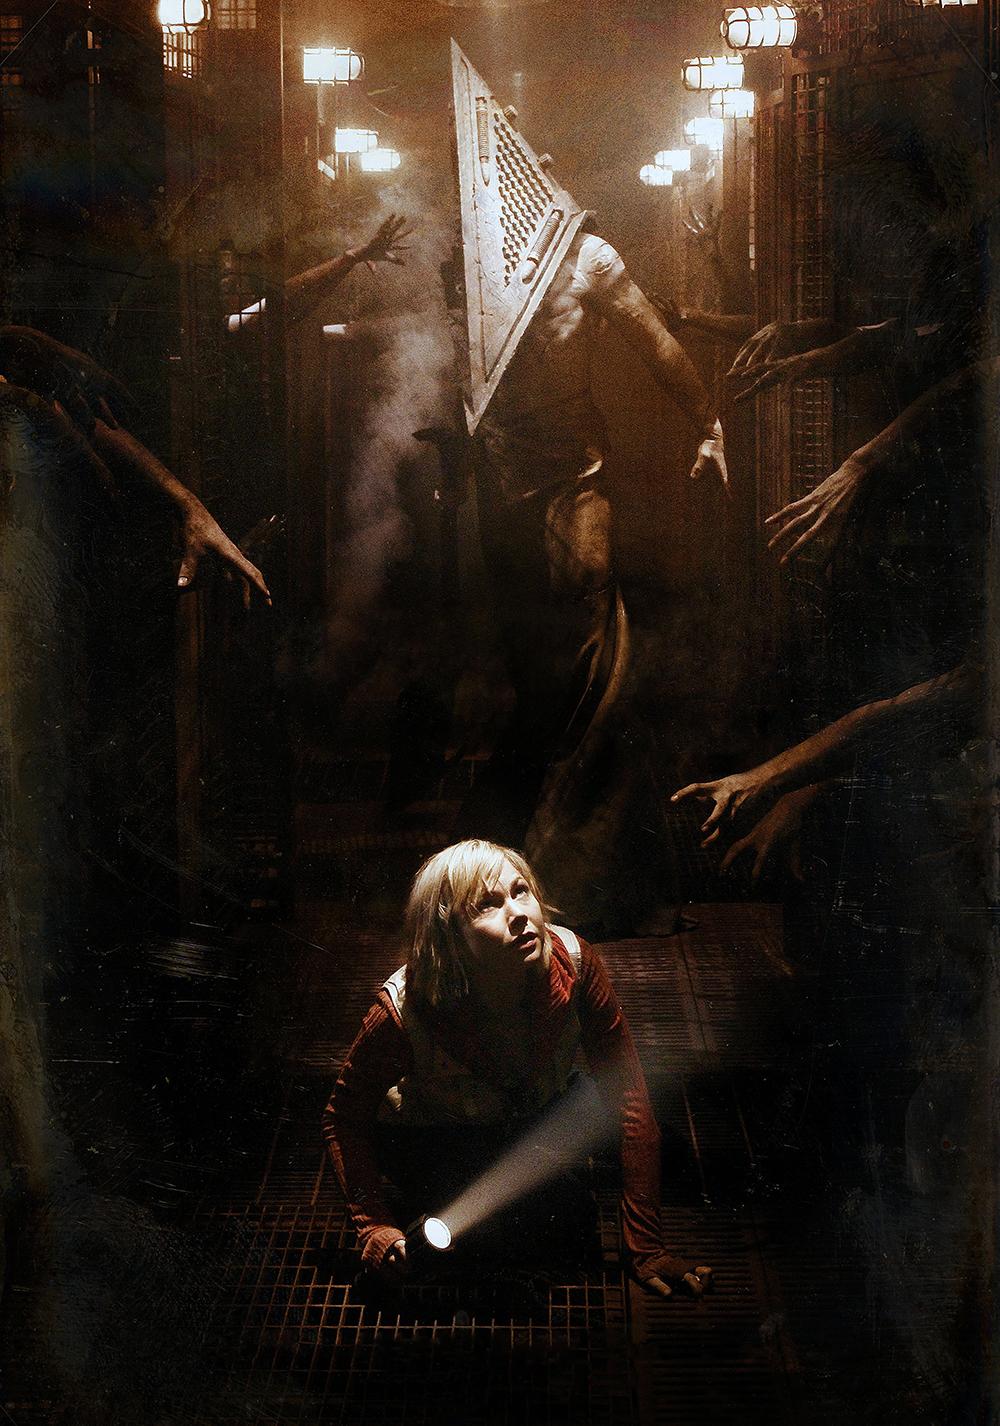 Silent Hill | Movie fanart | fanart.tv |Silent Hill Movie Poster